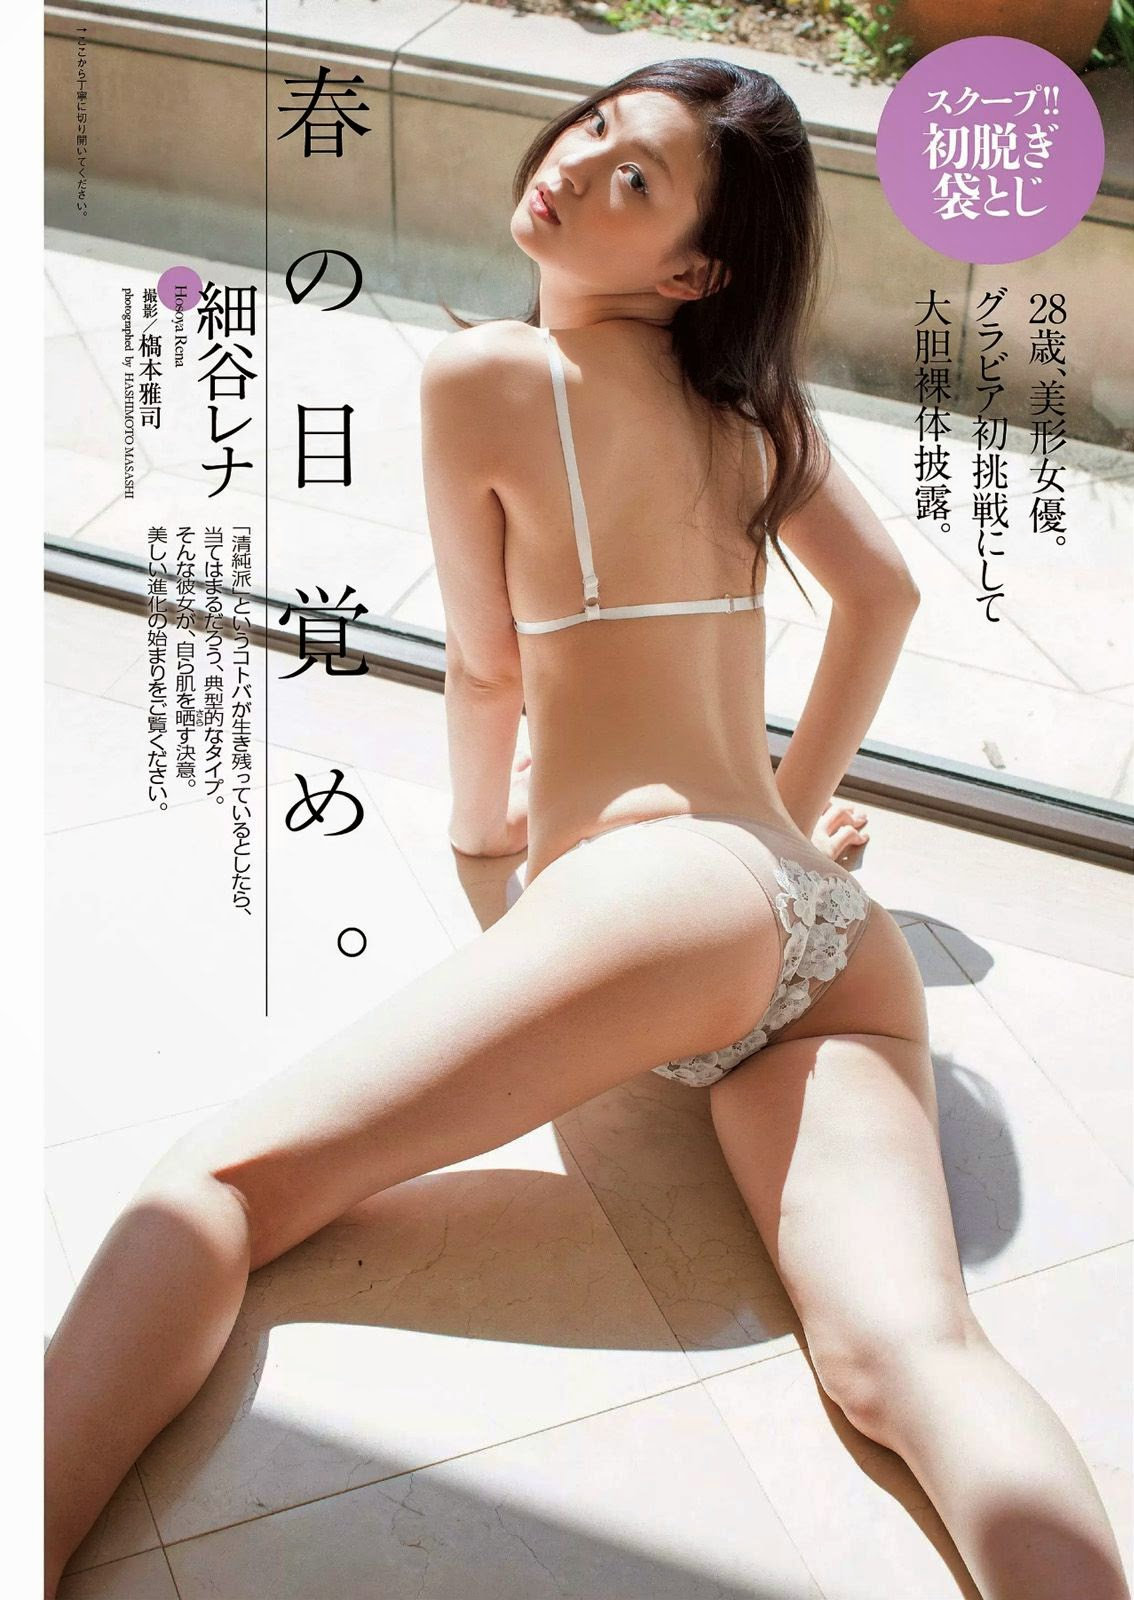 Hosoya Rena 細谷レナ Weekly Playboy 週刊プレイボーイ No 18 2015 Images